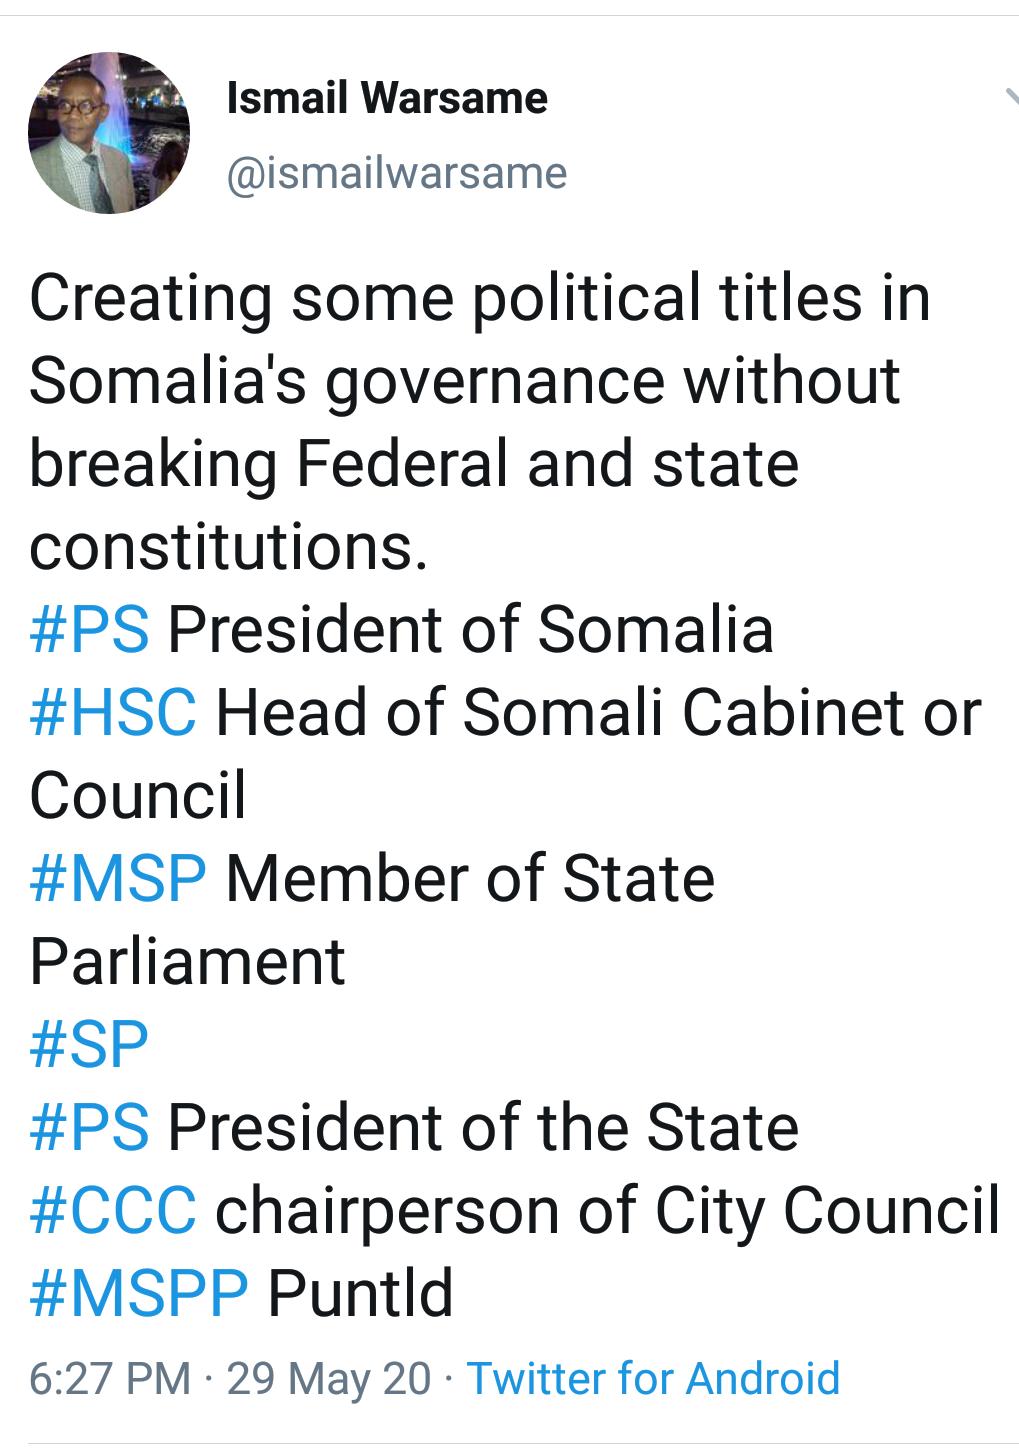 IN SOMALIA, WE NEED TO BE CREATIVETHINKERS.